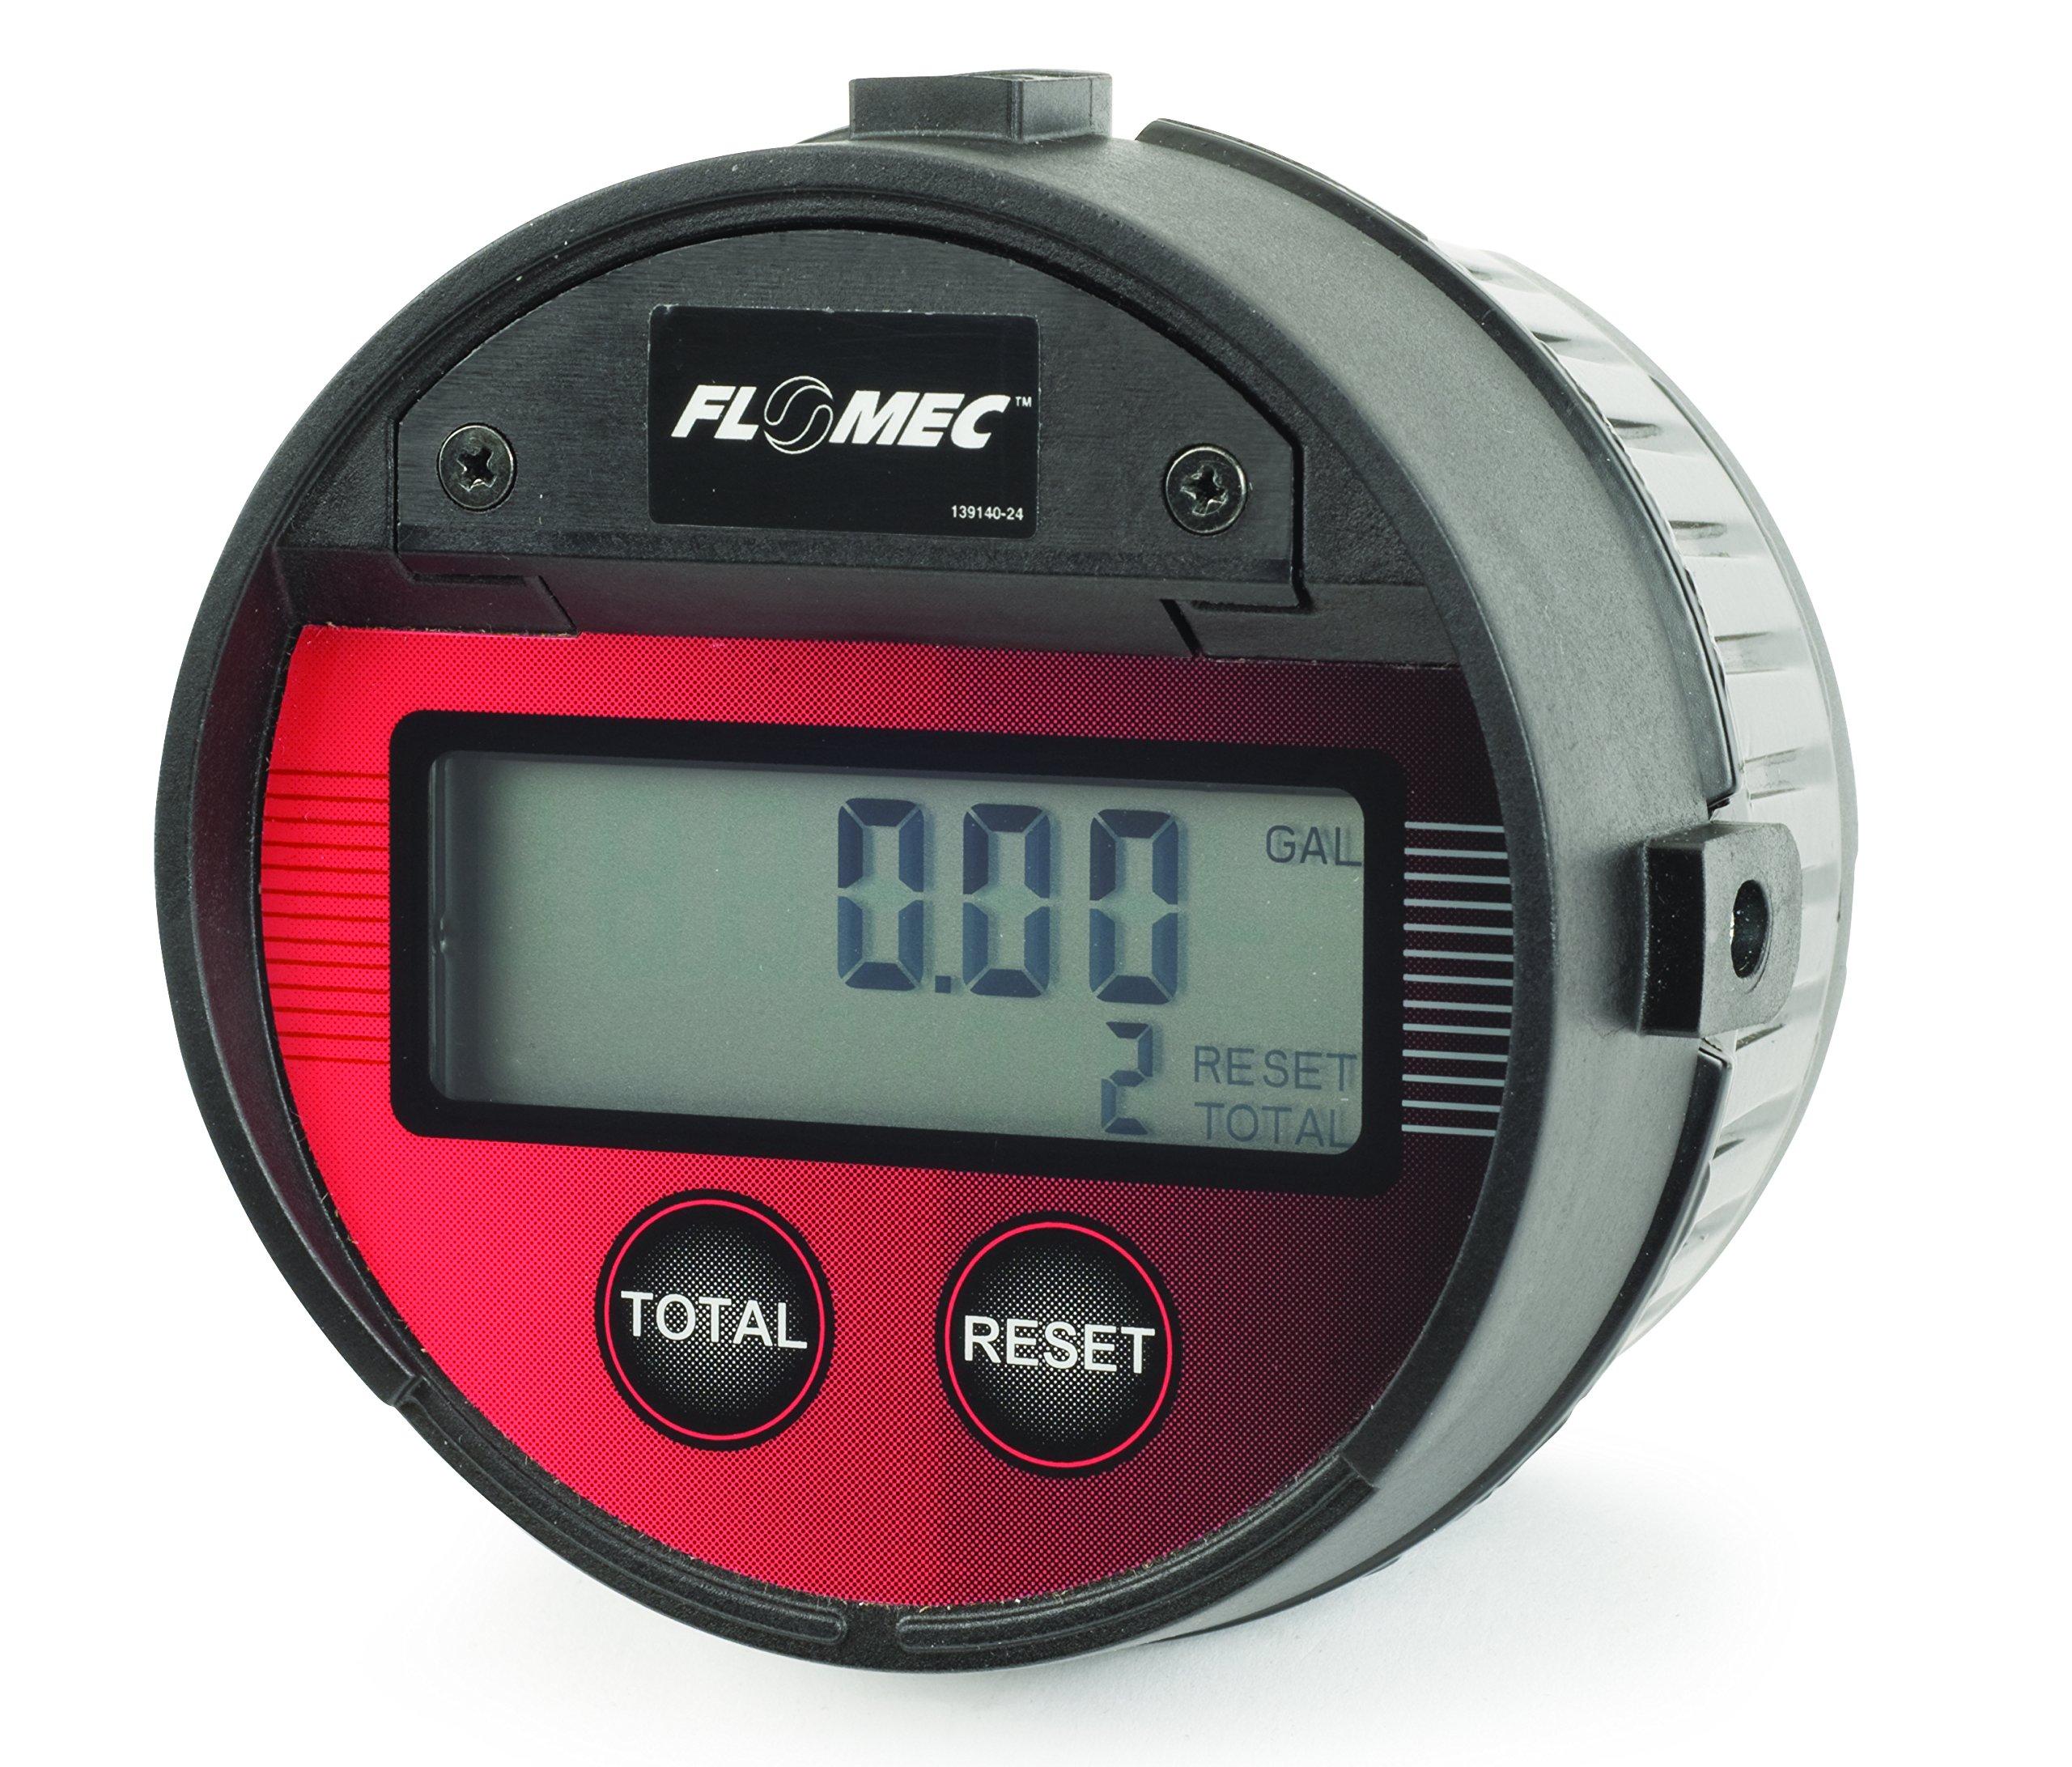 GPI LM51DN Aluminum Oval Gear Flowmeter, 0.26 to 7.8 gpm Flow Range, 1/2'' FNPT